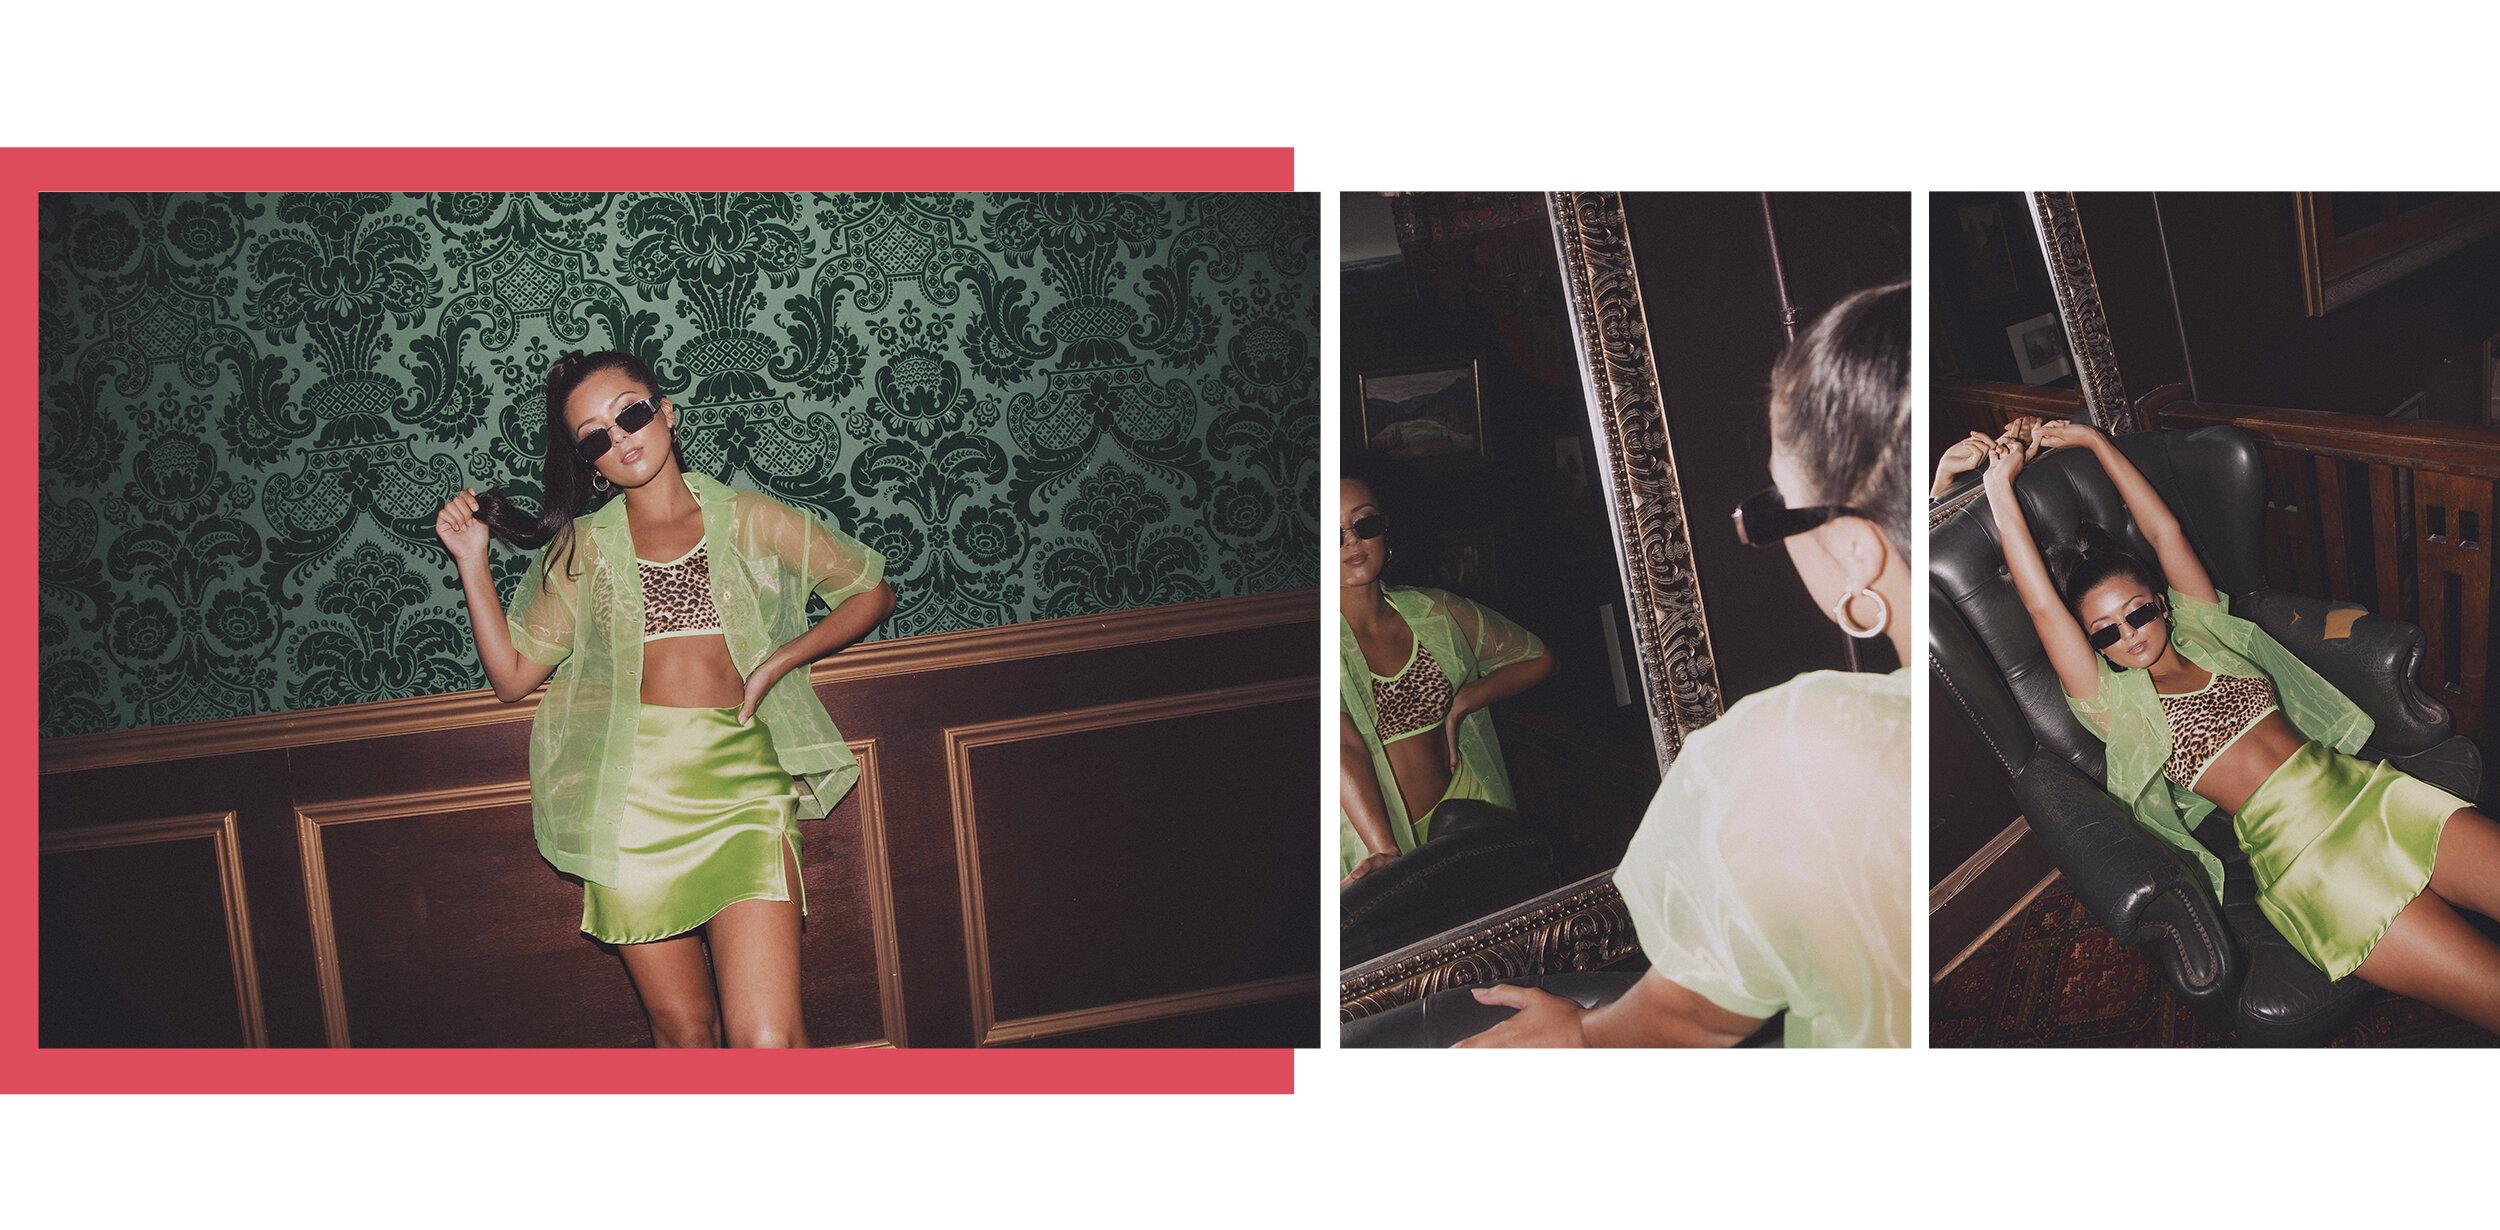 Zoe wears the  Lime Organza Short Sleeved Shirt,   Odessa Top,   Adama Mini Skirt,   Elsa Earrings  and  Diablo Sunglasses.